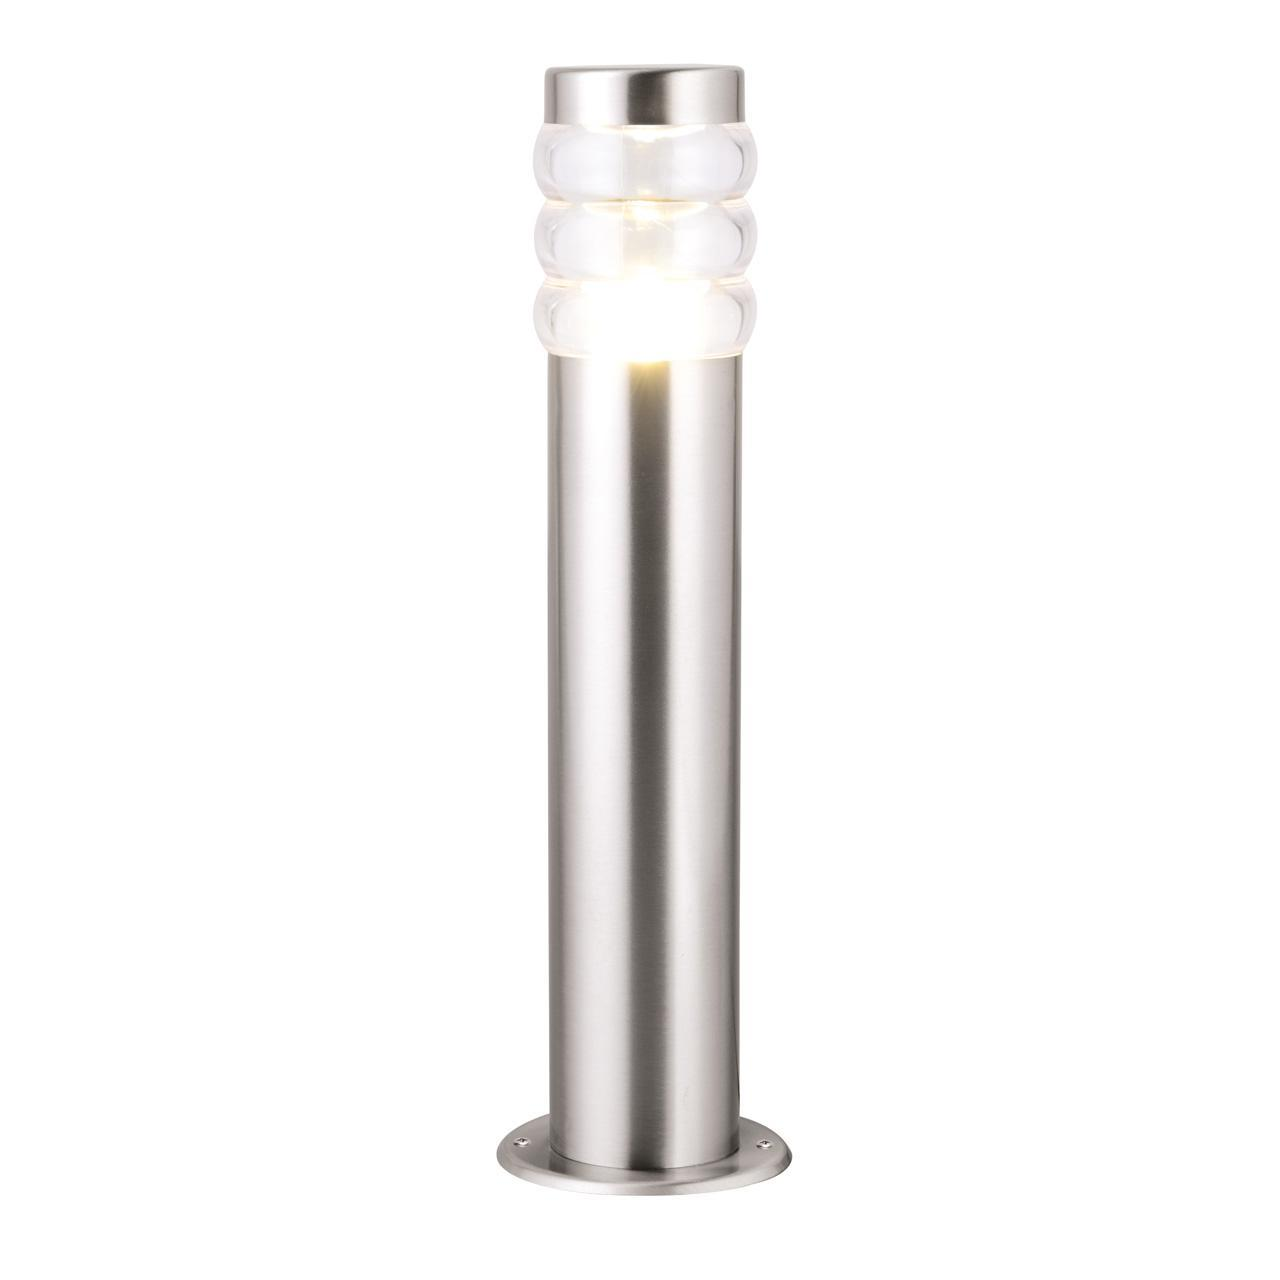 Уличный светильник Arte Lamp Portico A8381PA-1SS цена